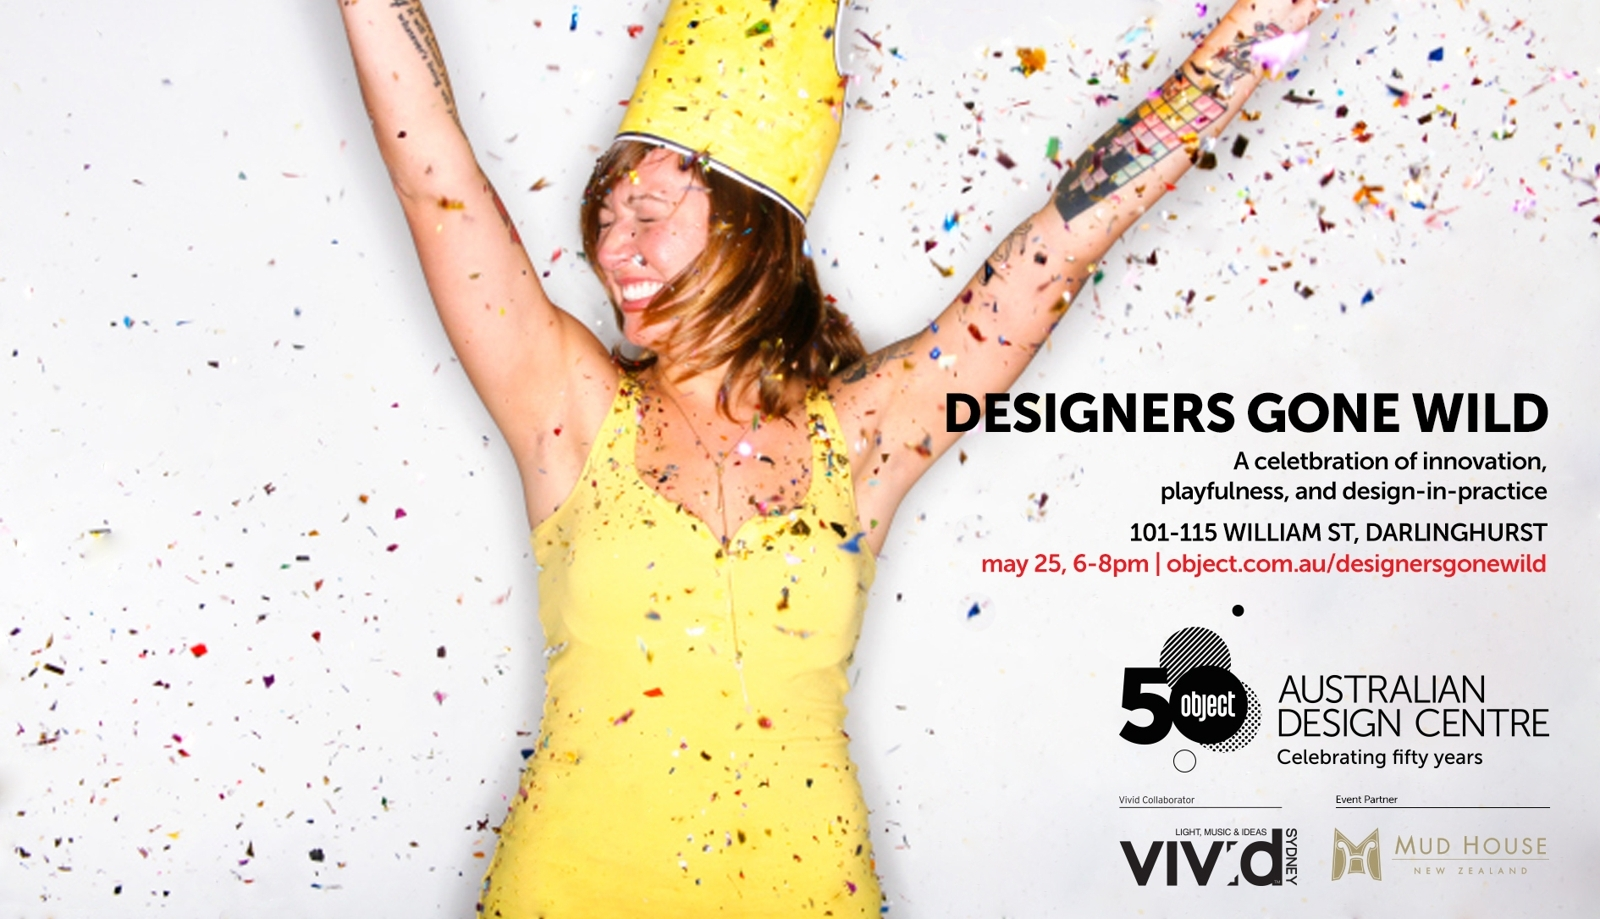 Designers Gone Wild image